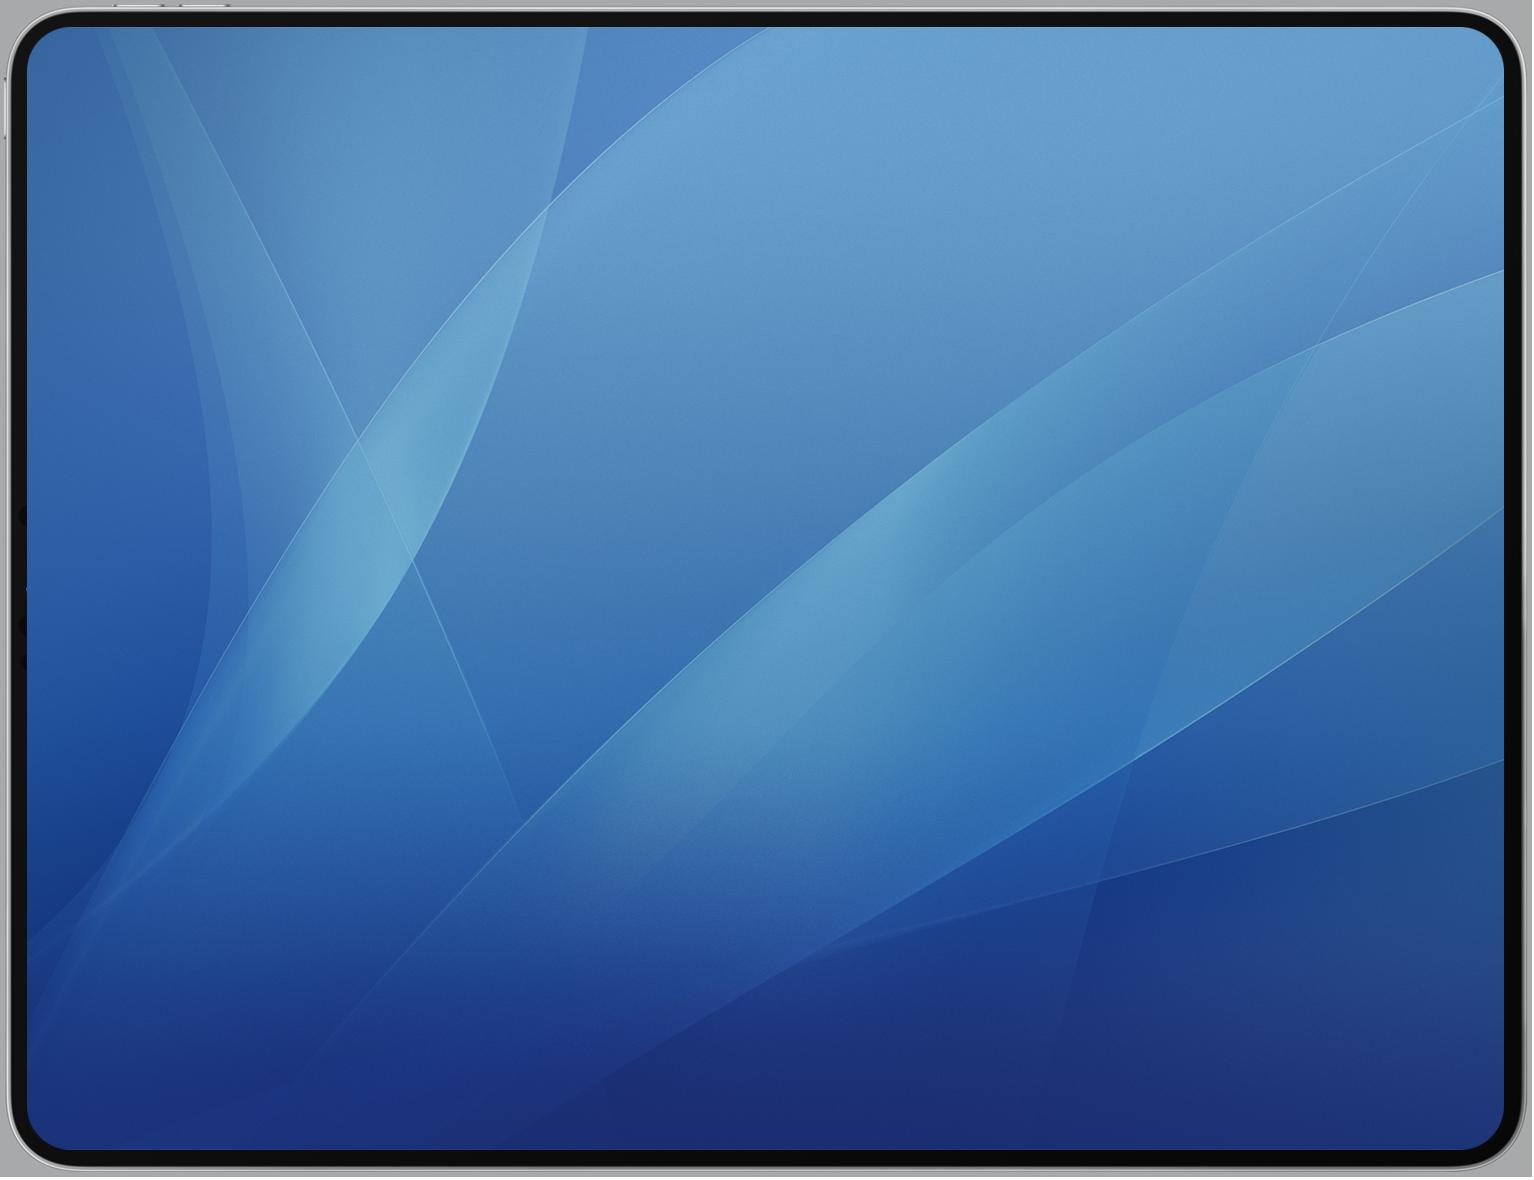 iPad X.png